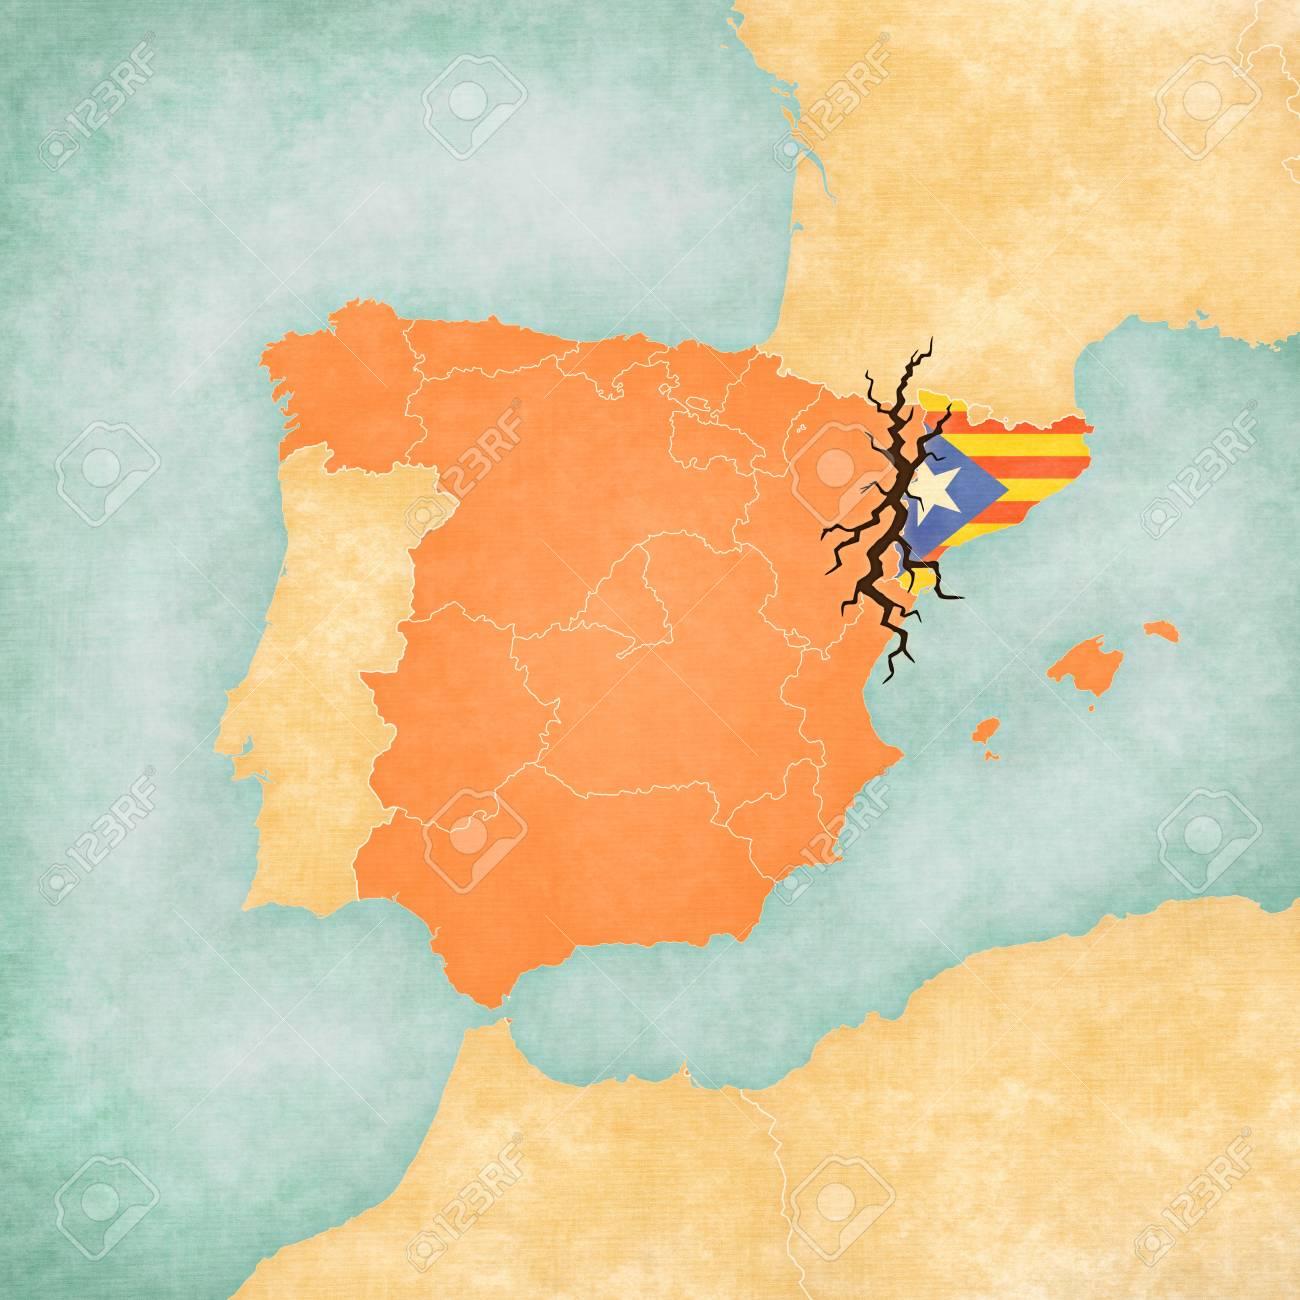 Map Of Spain Catalonia.Stock Illustration